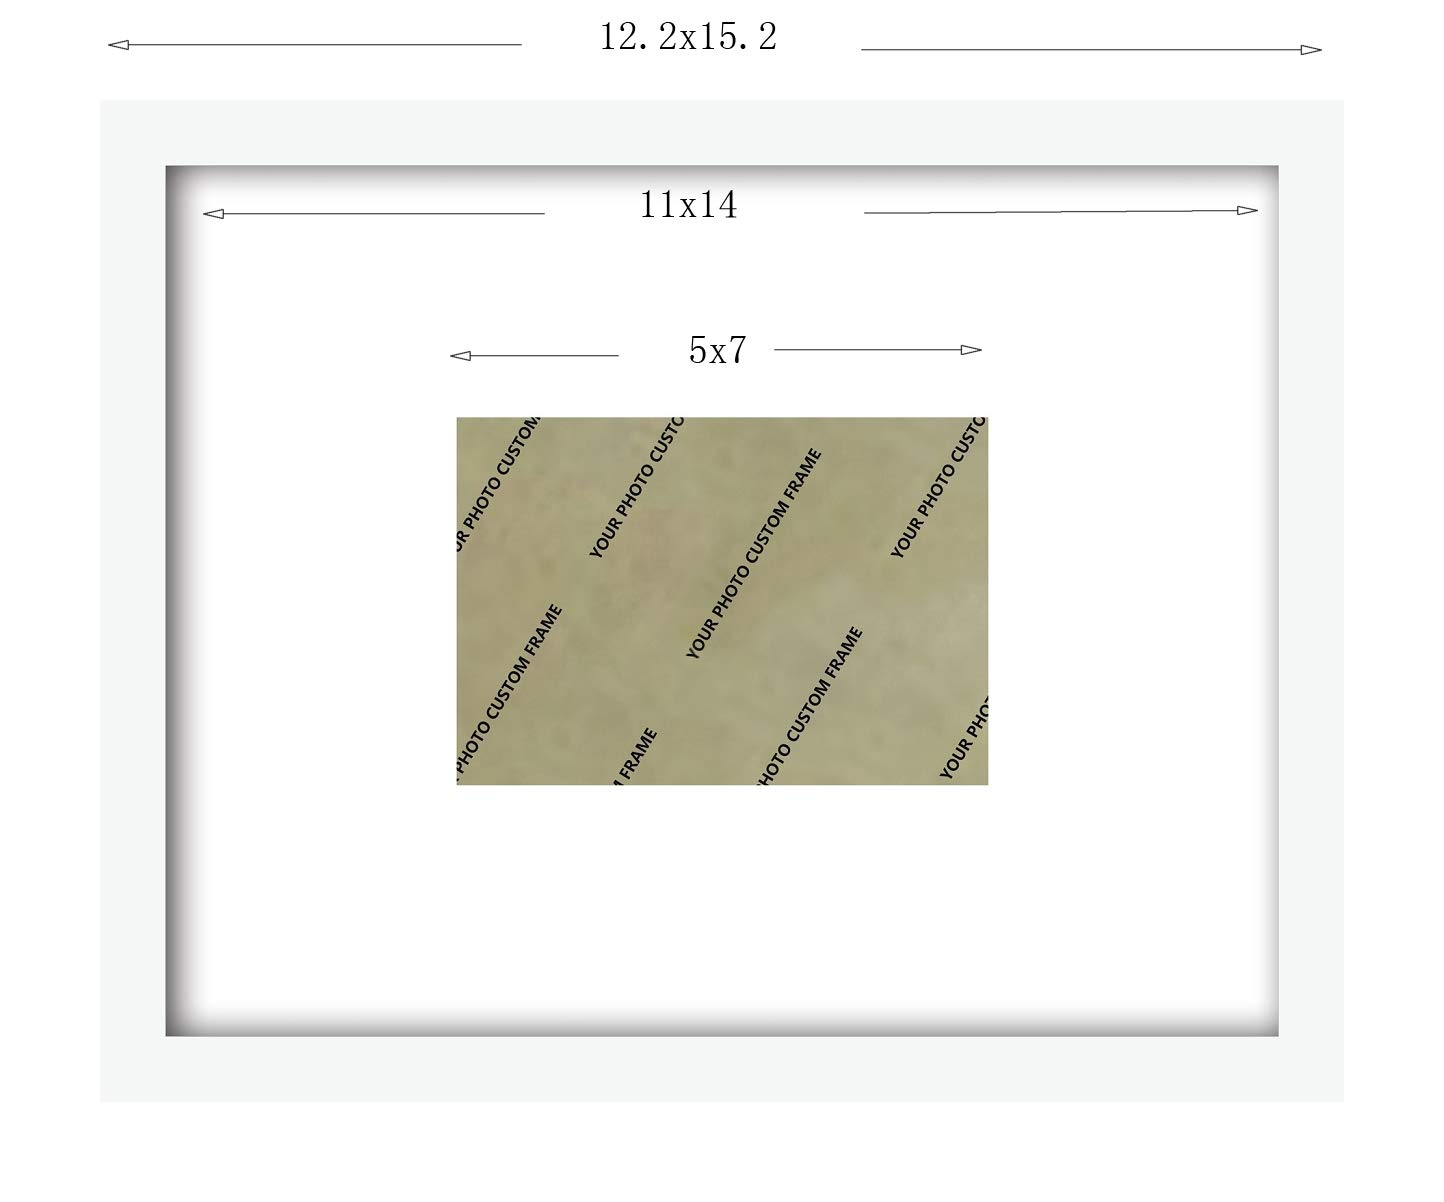 Amazon.de: xufly 11 x 14 Echtglas Holz Rahmen weiß 3 Art Matte ...